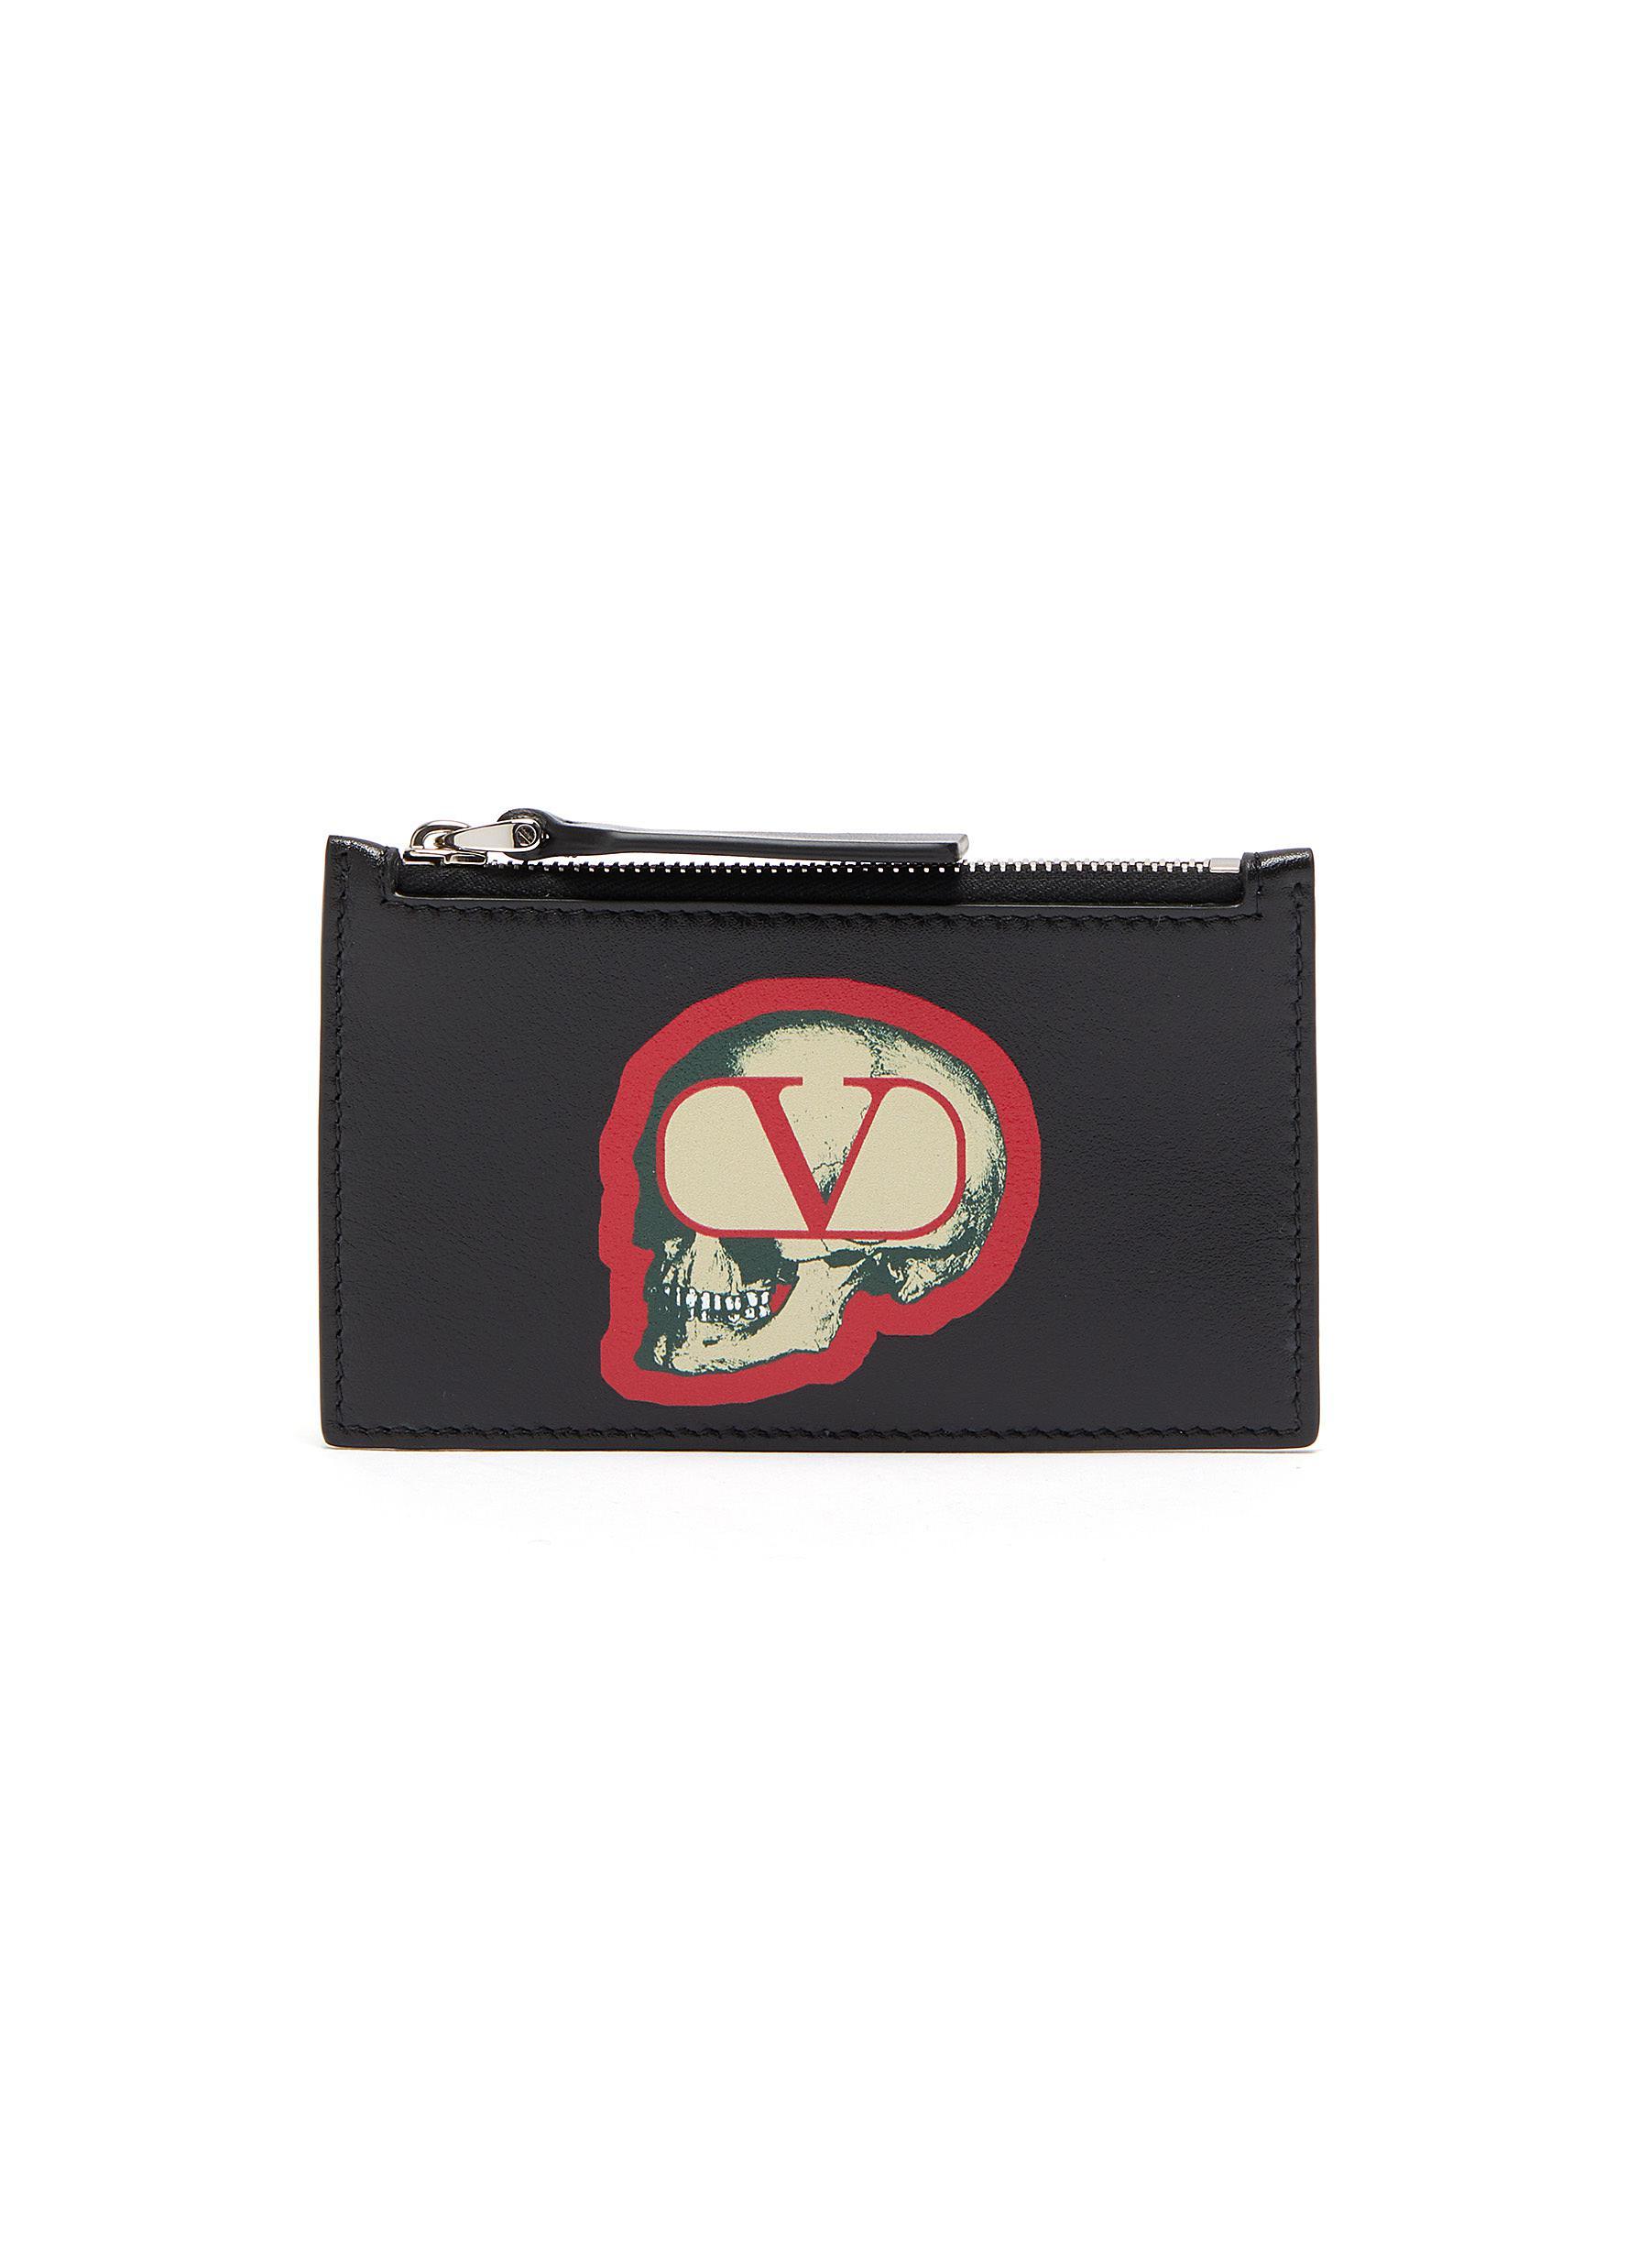 Valentino X Undercover Skull Vlogo Print Leather Card Holder